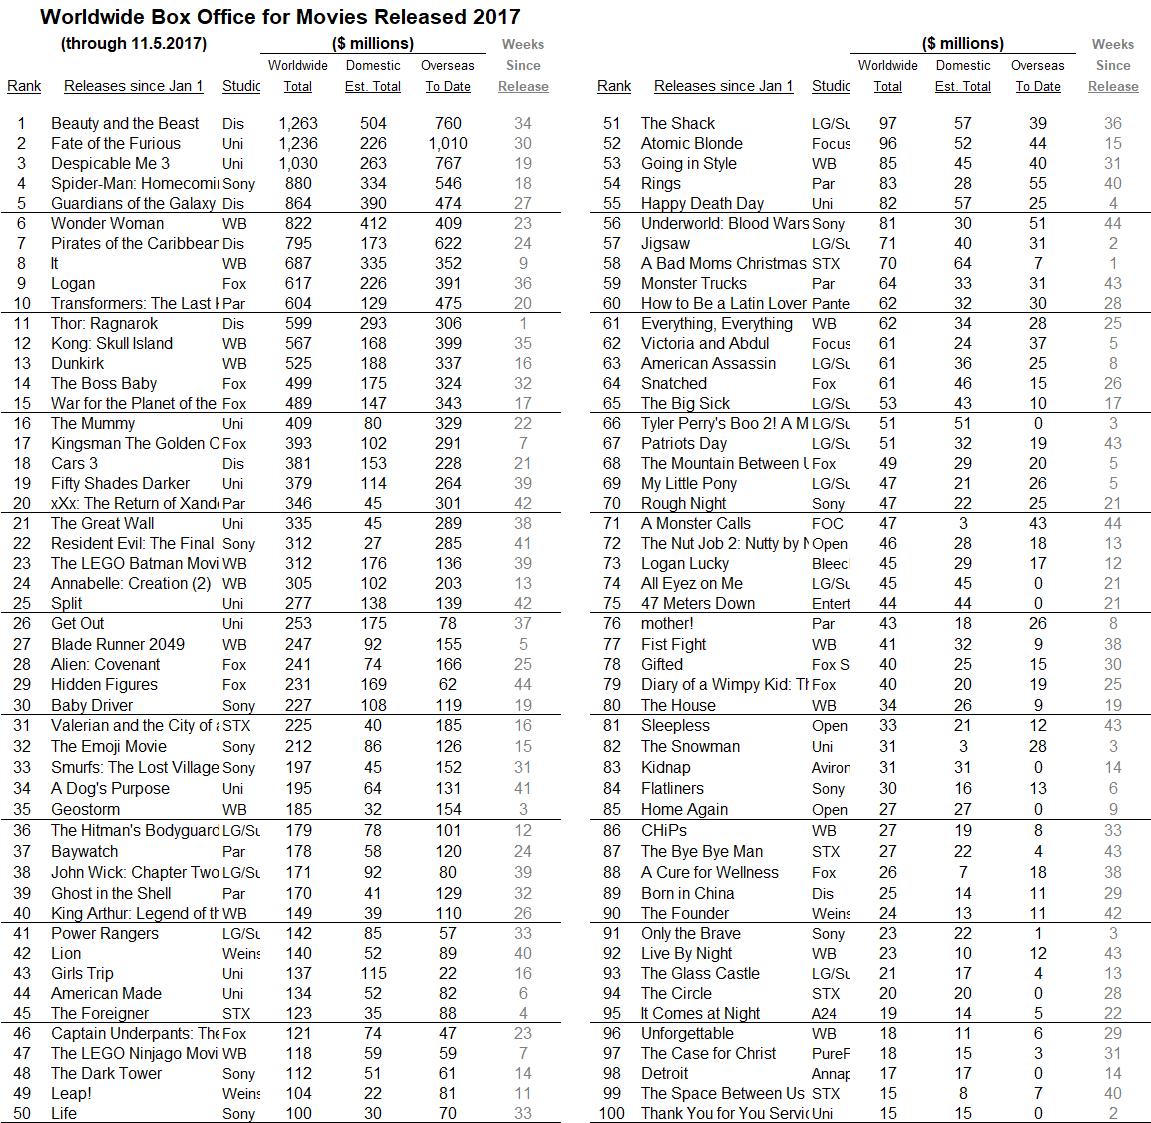 International 2017 through 2017 Nov 05